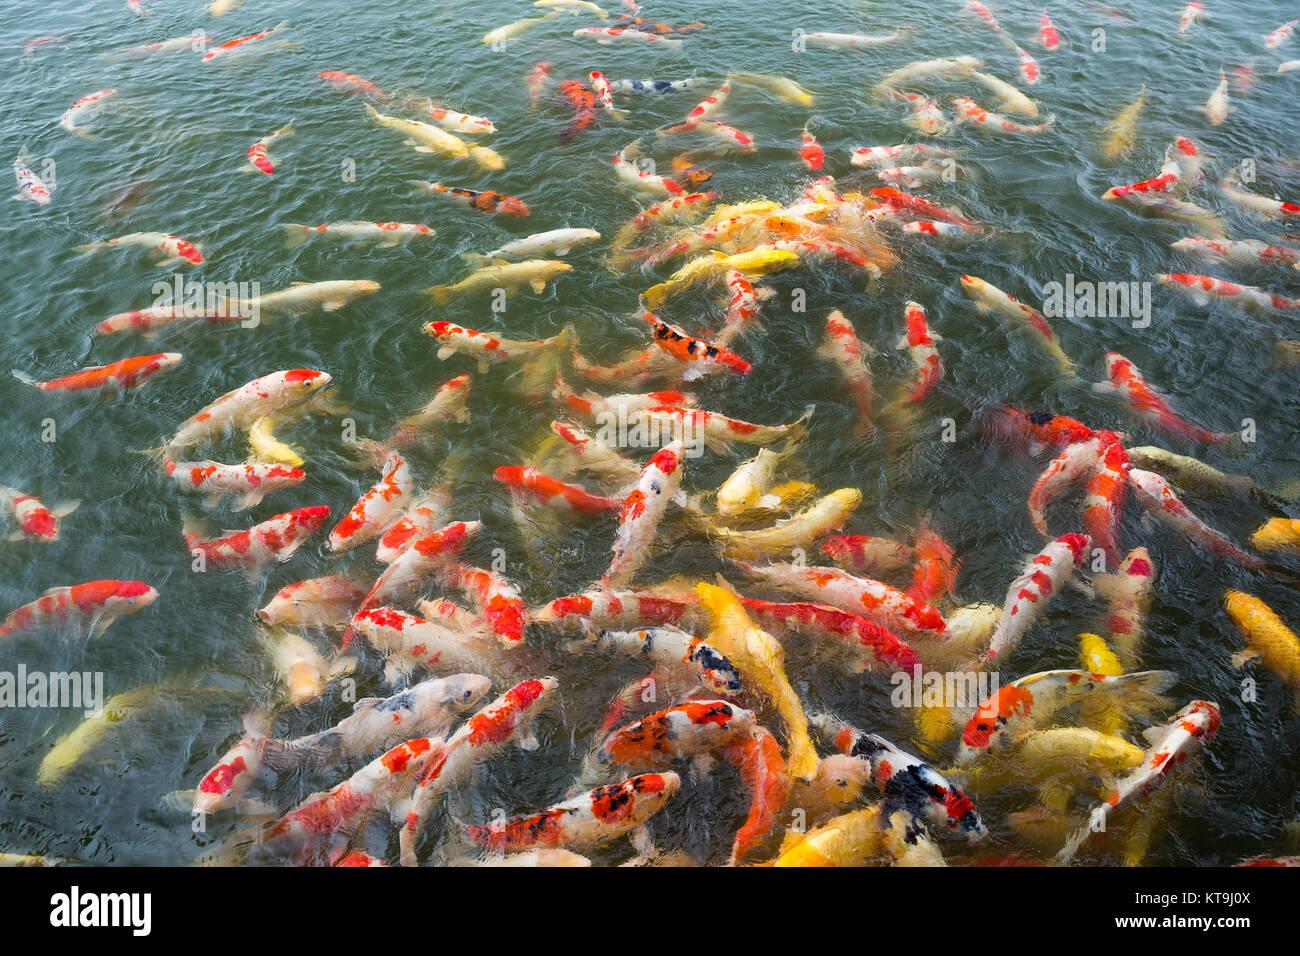 Bighead carp stock photos bighead carp stock images alamy for Colorful pond fish